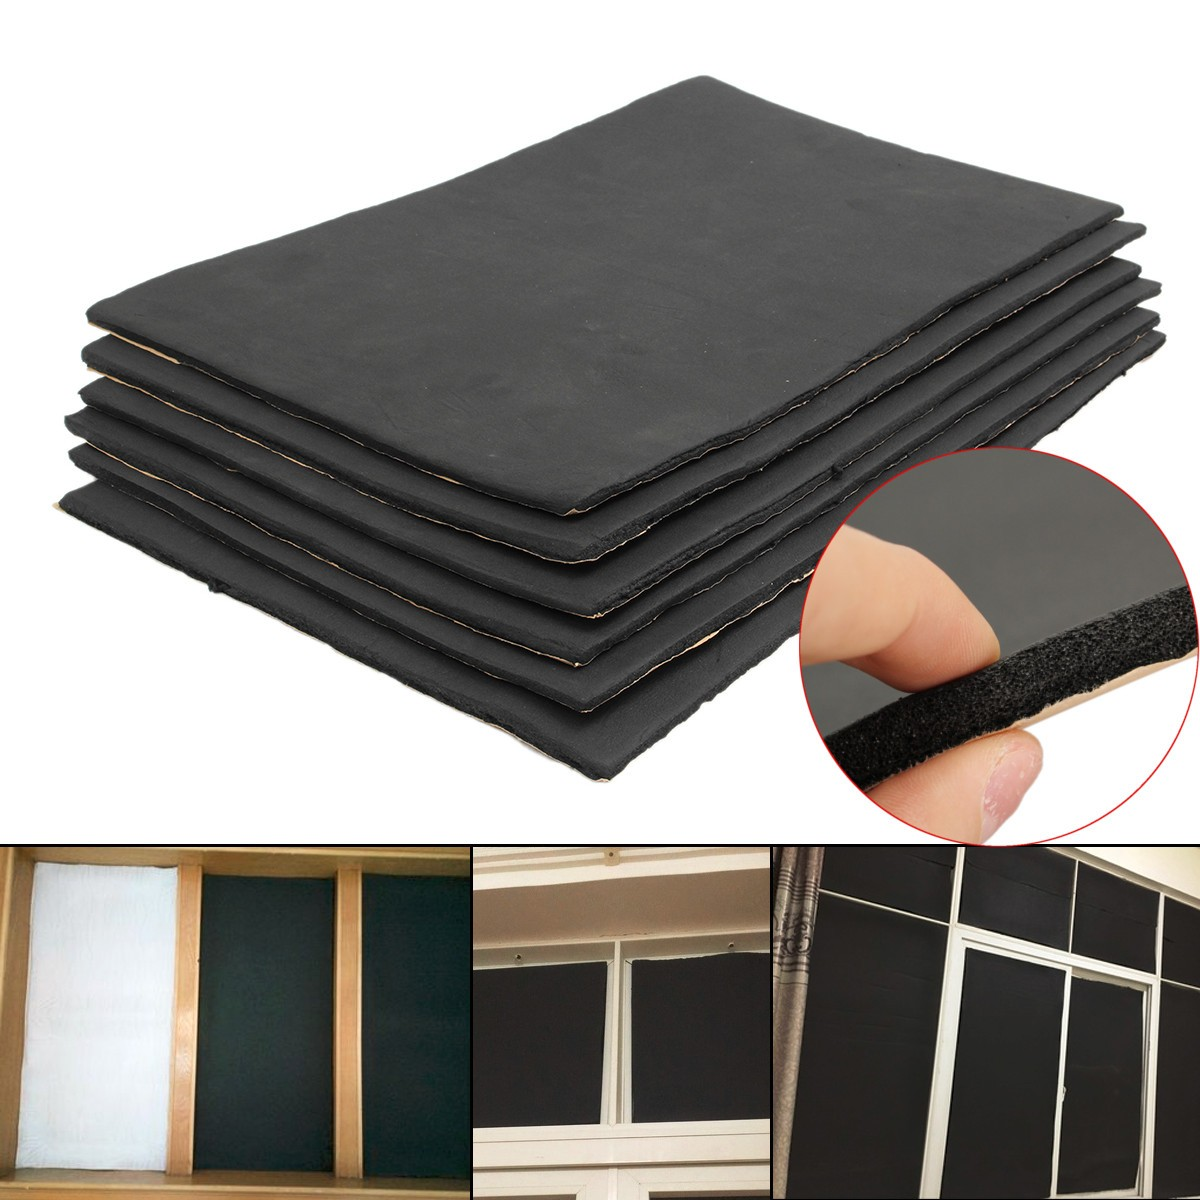 6pcs/set 30cmx50cm Car Sound Proofing Deadening Anti-noise Sound Insulation Cotton Heat Closed Cell Foam Interior Accessories